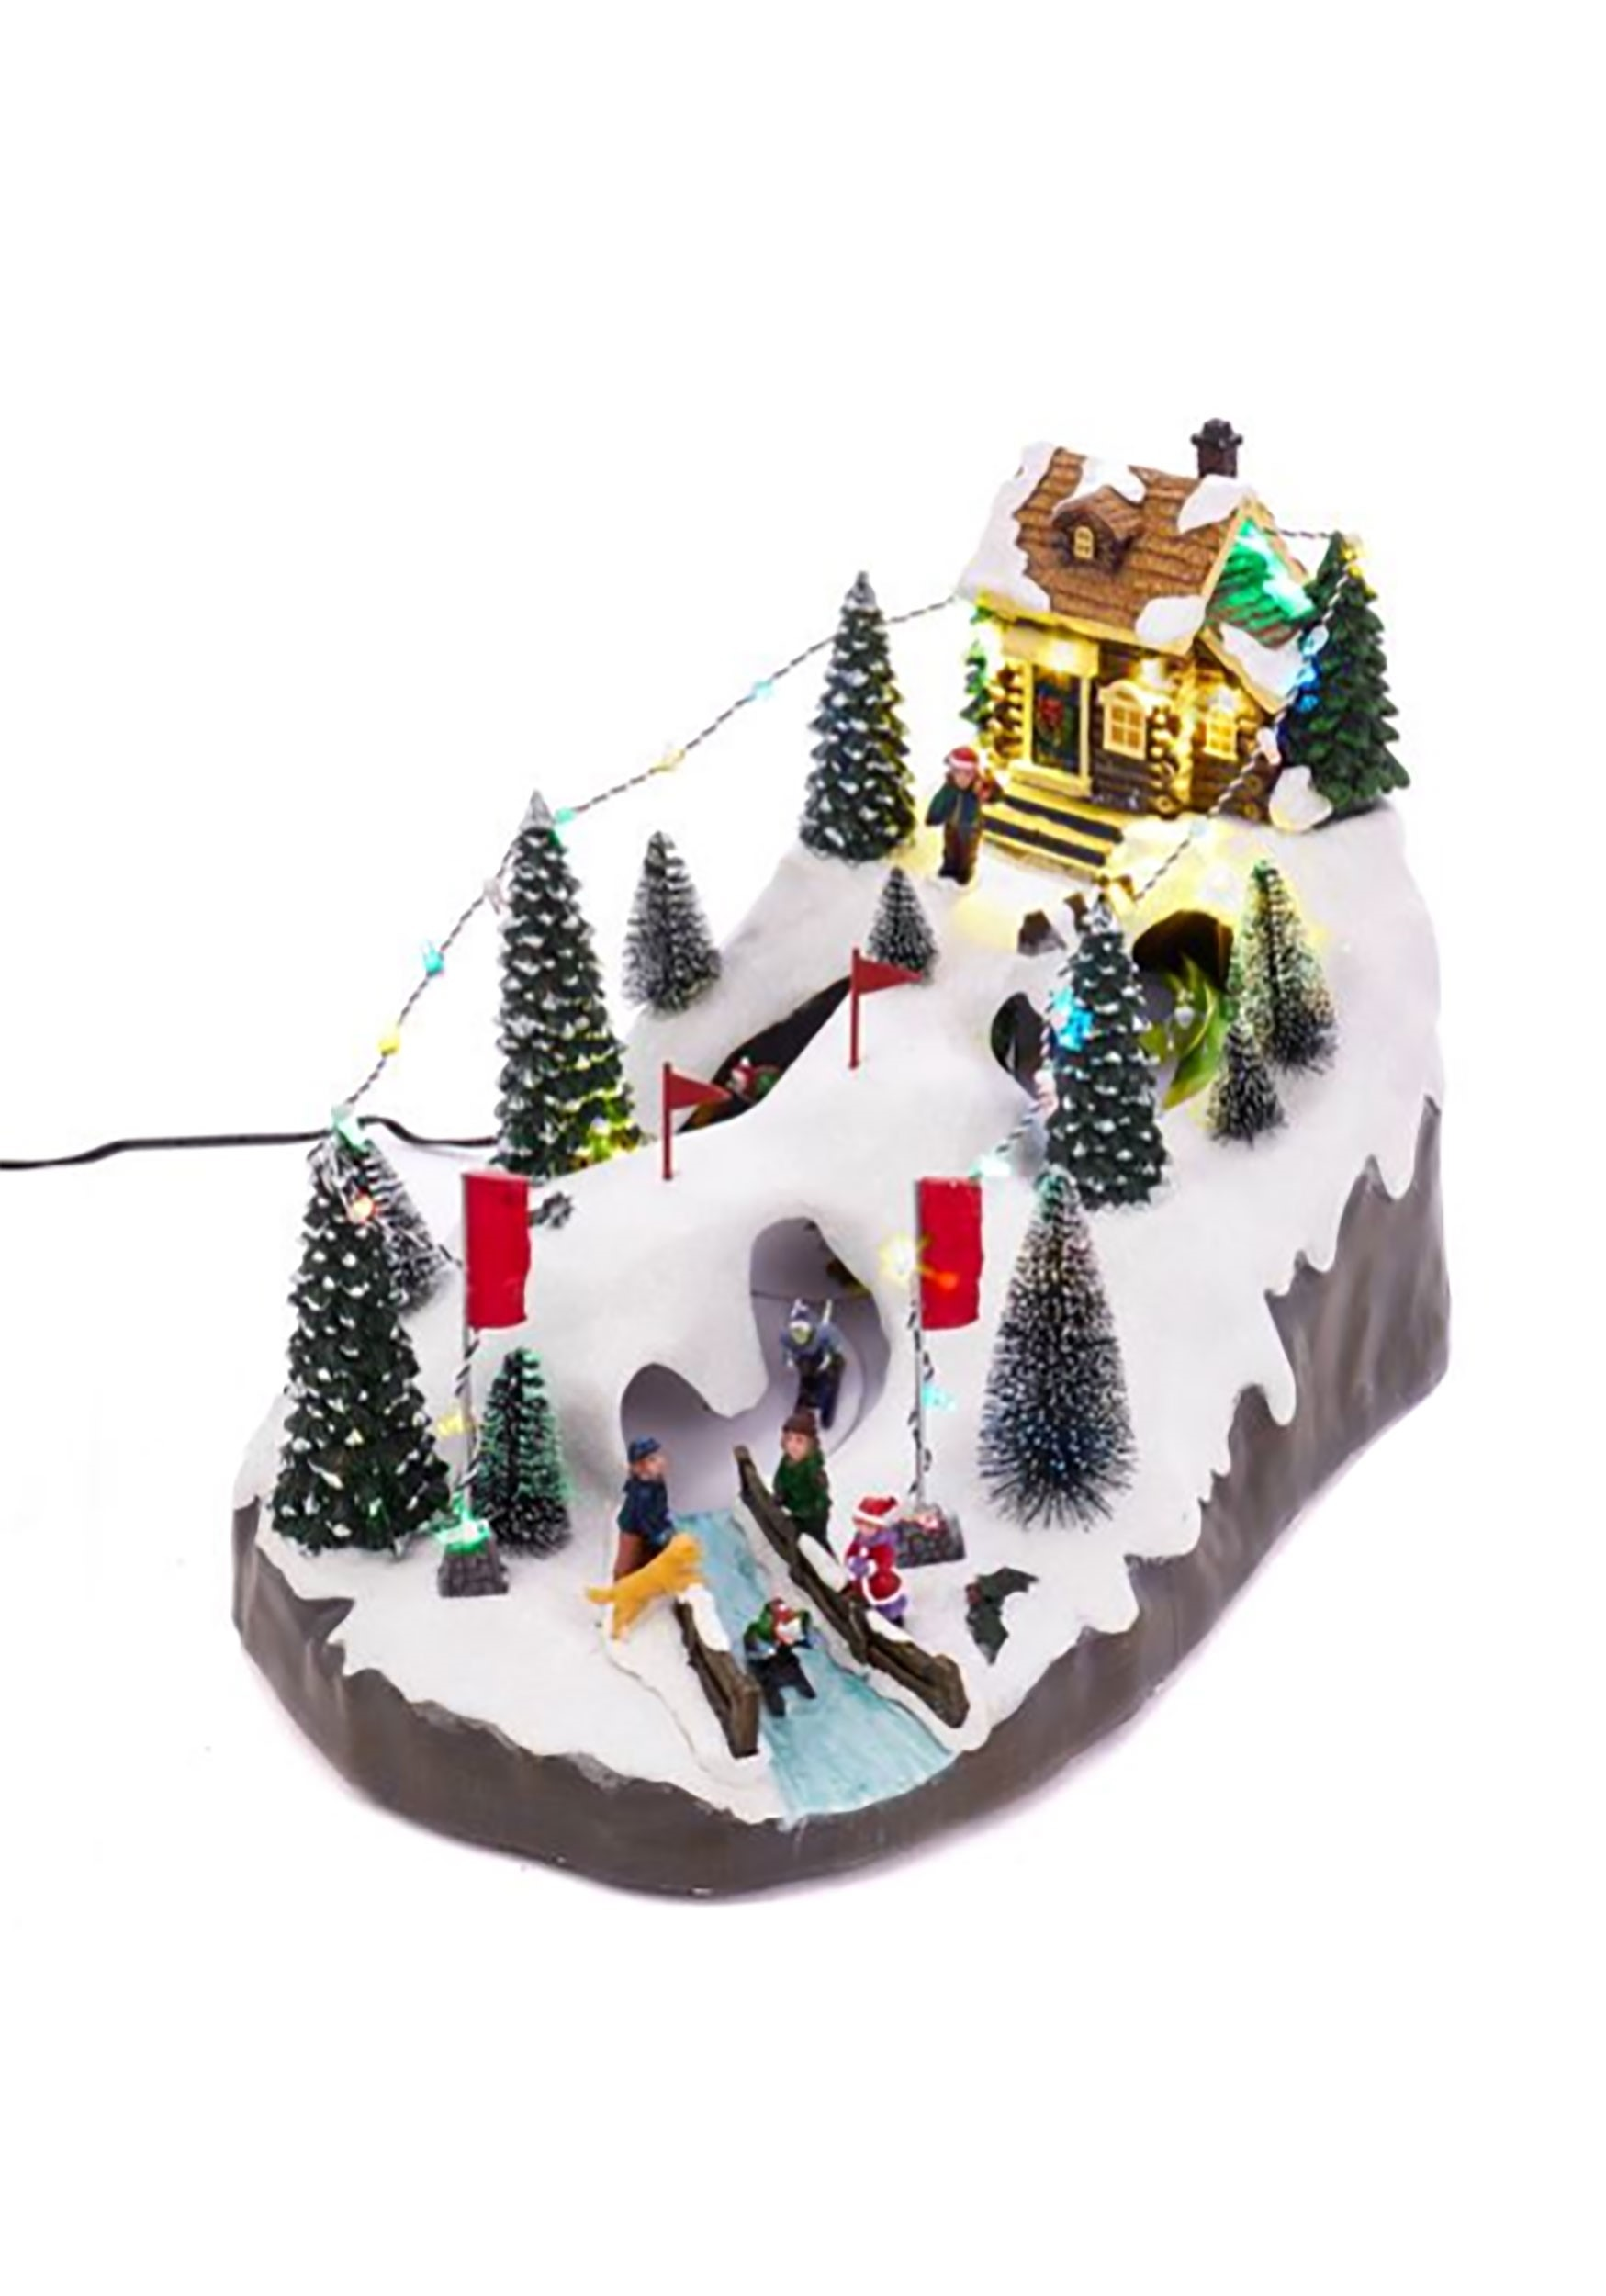 LED Christmas Skiing Village